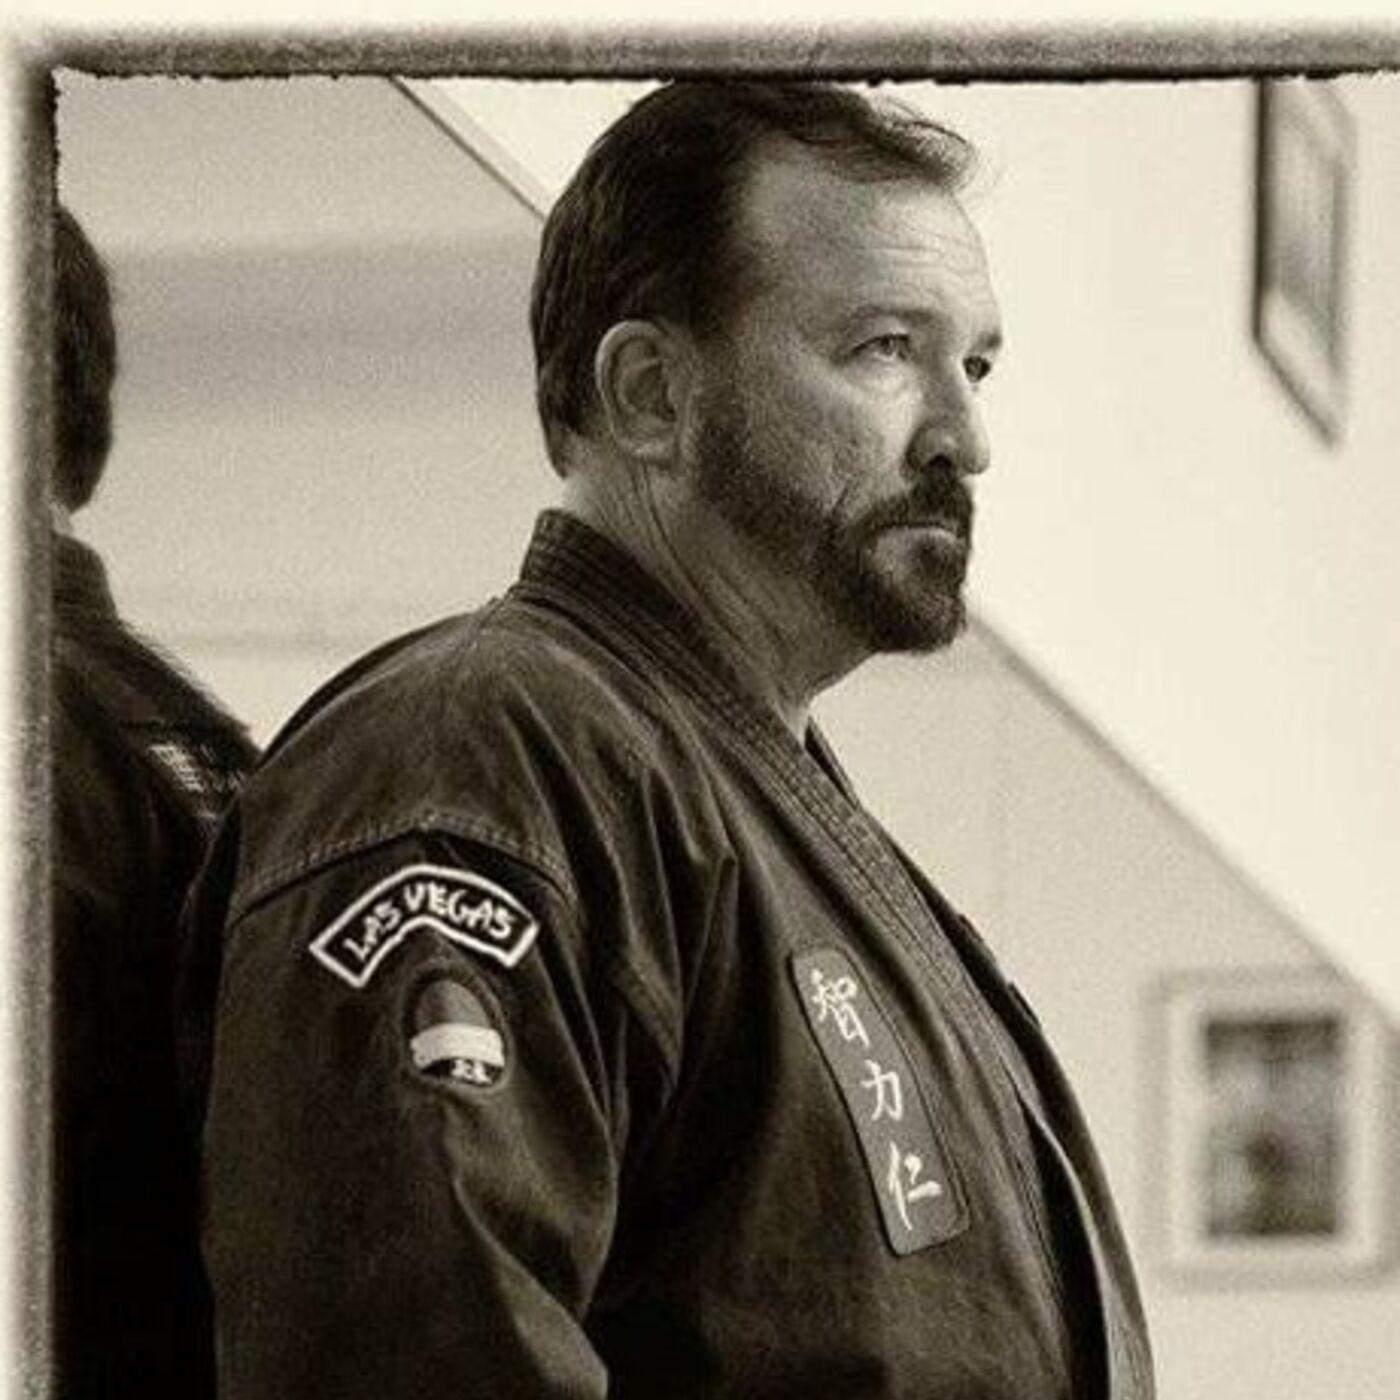 Martial Arts Movie Star, Jeff Speakman - on life